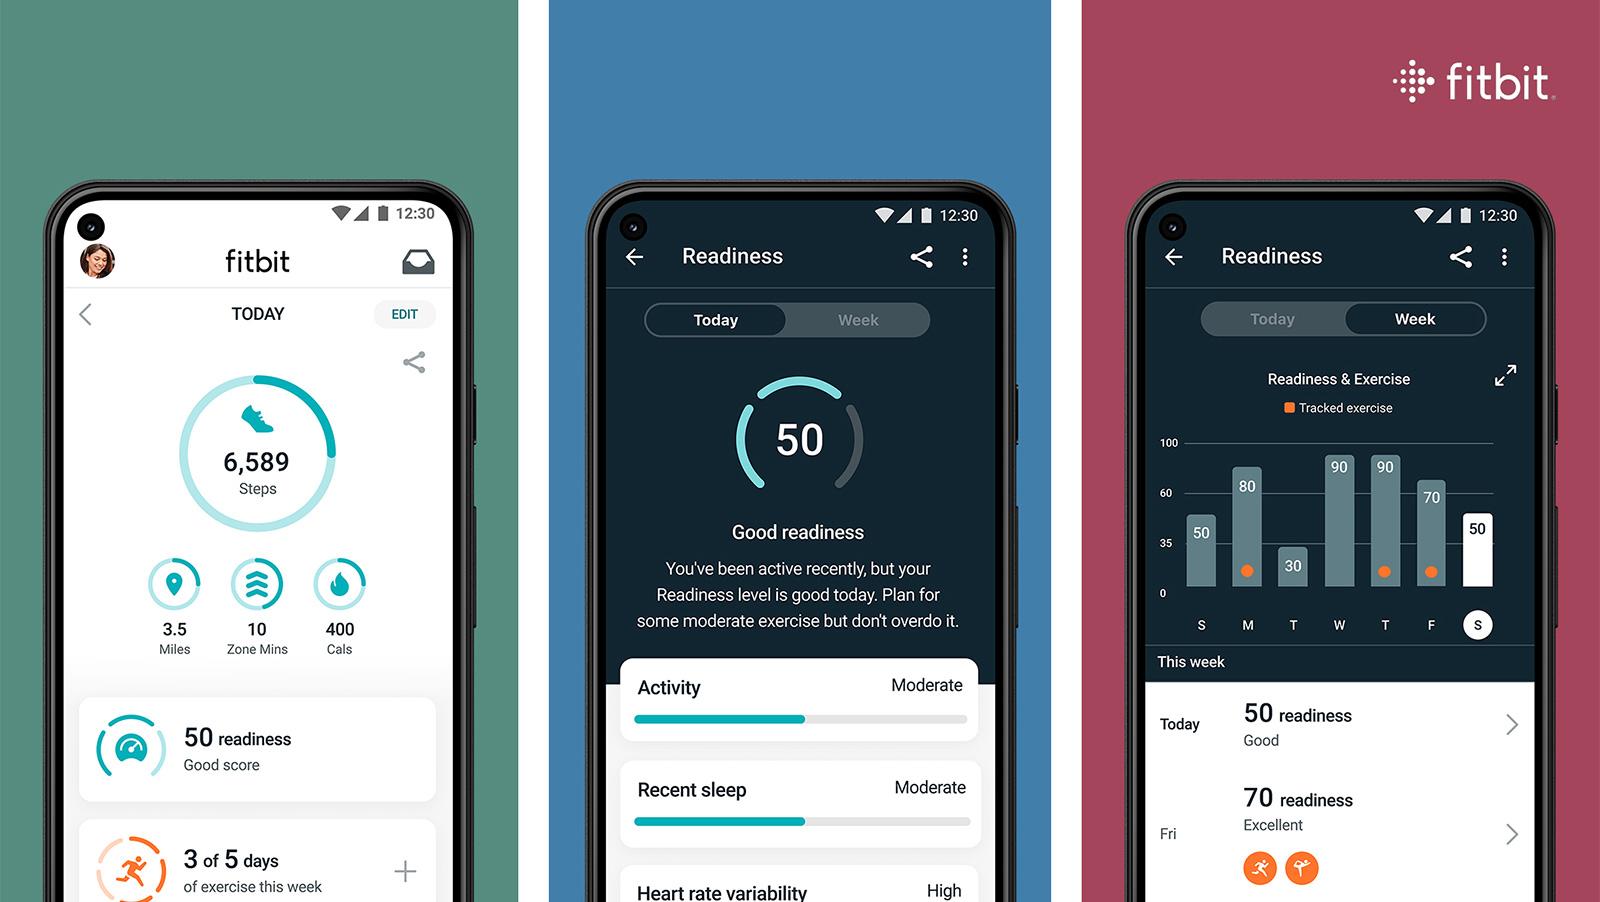 Fitbit Premium - Daily Readiness